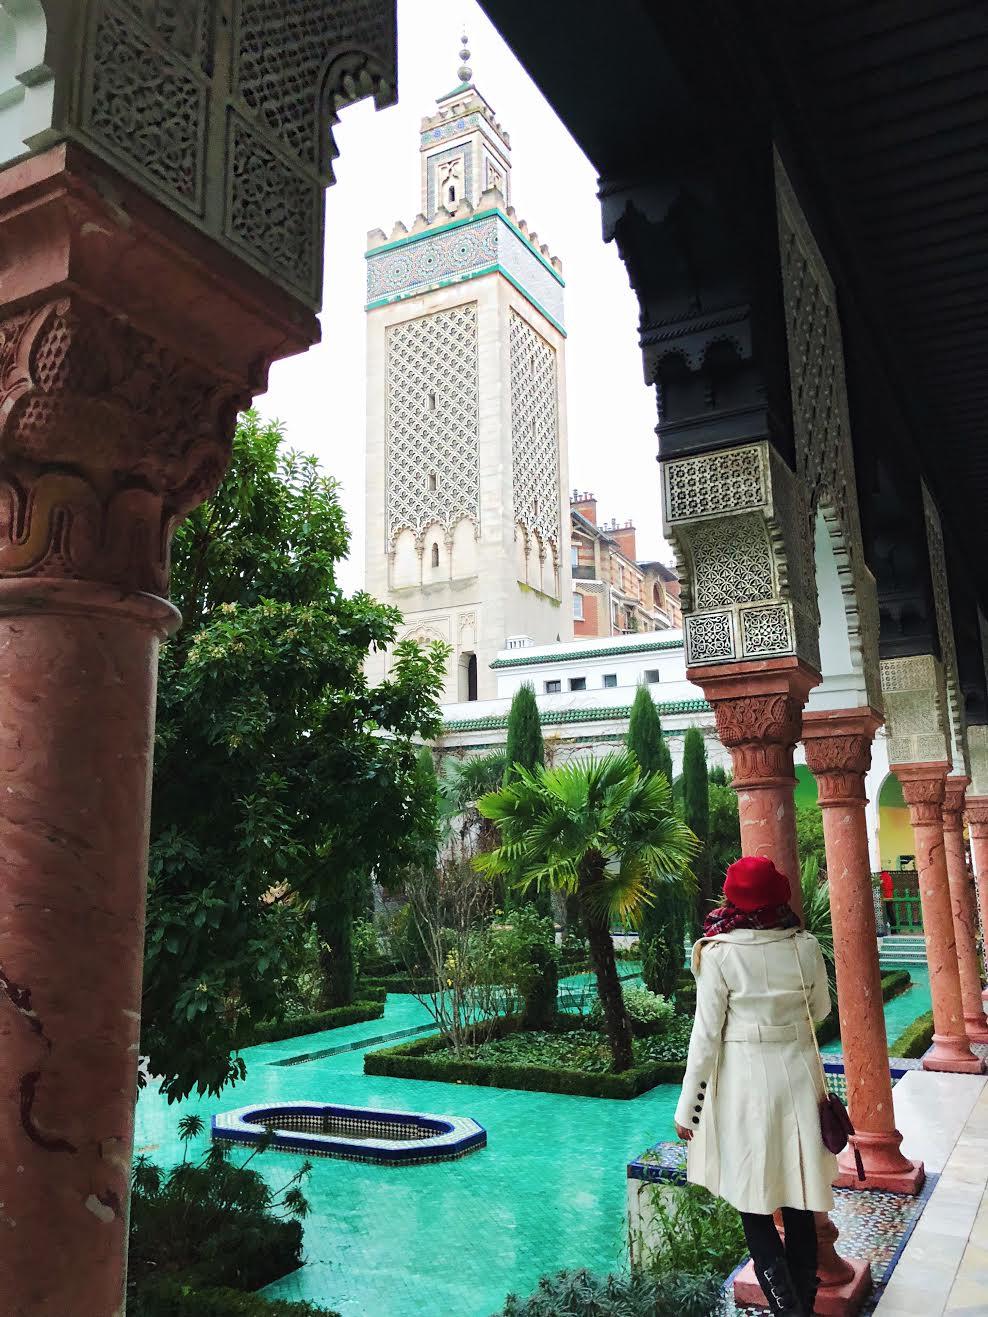 Muslim-travel-guide-Paris-Grand-Mosque-minaret.jpg